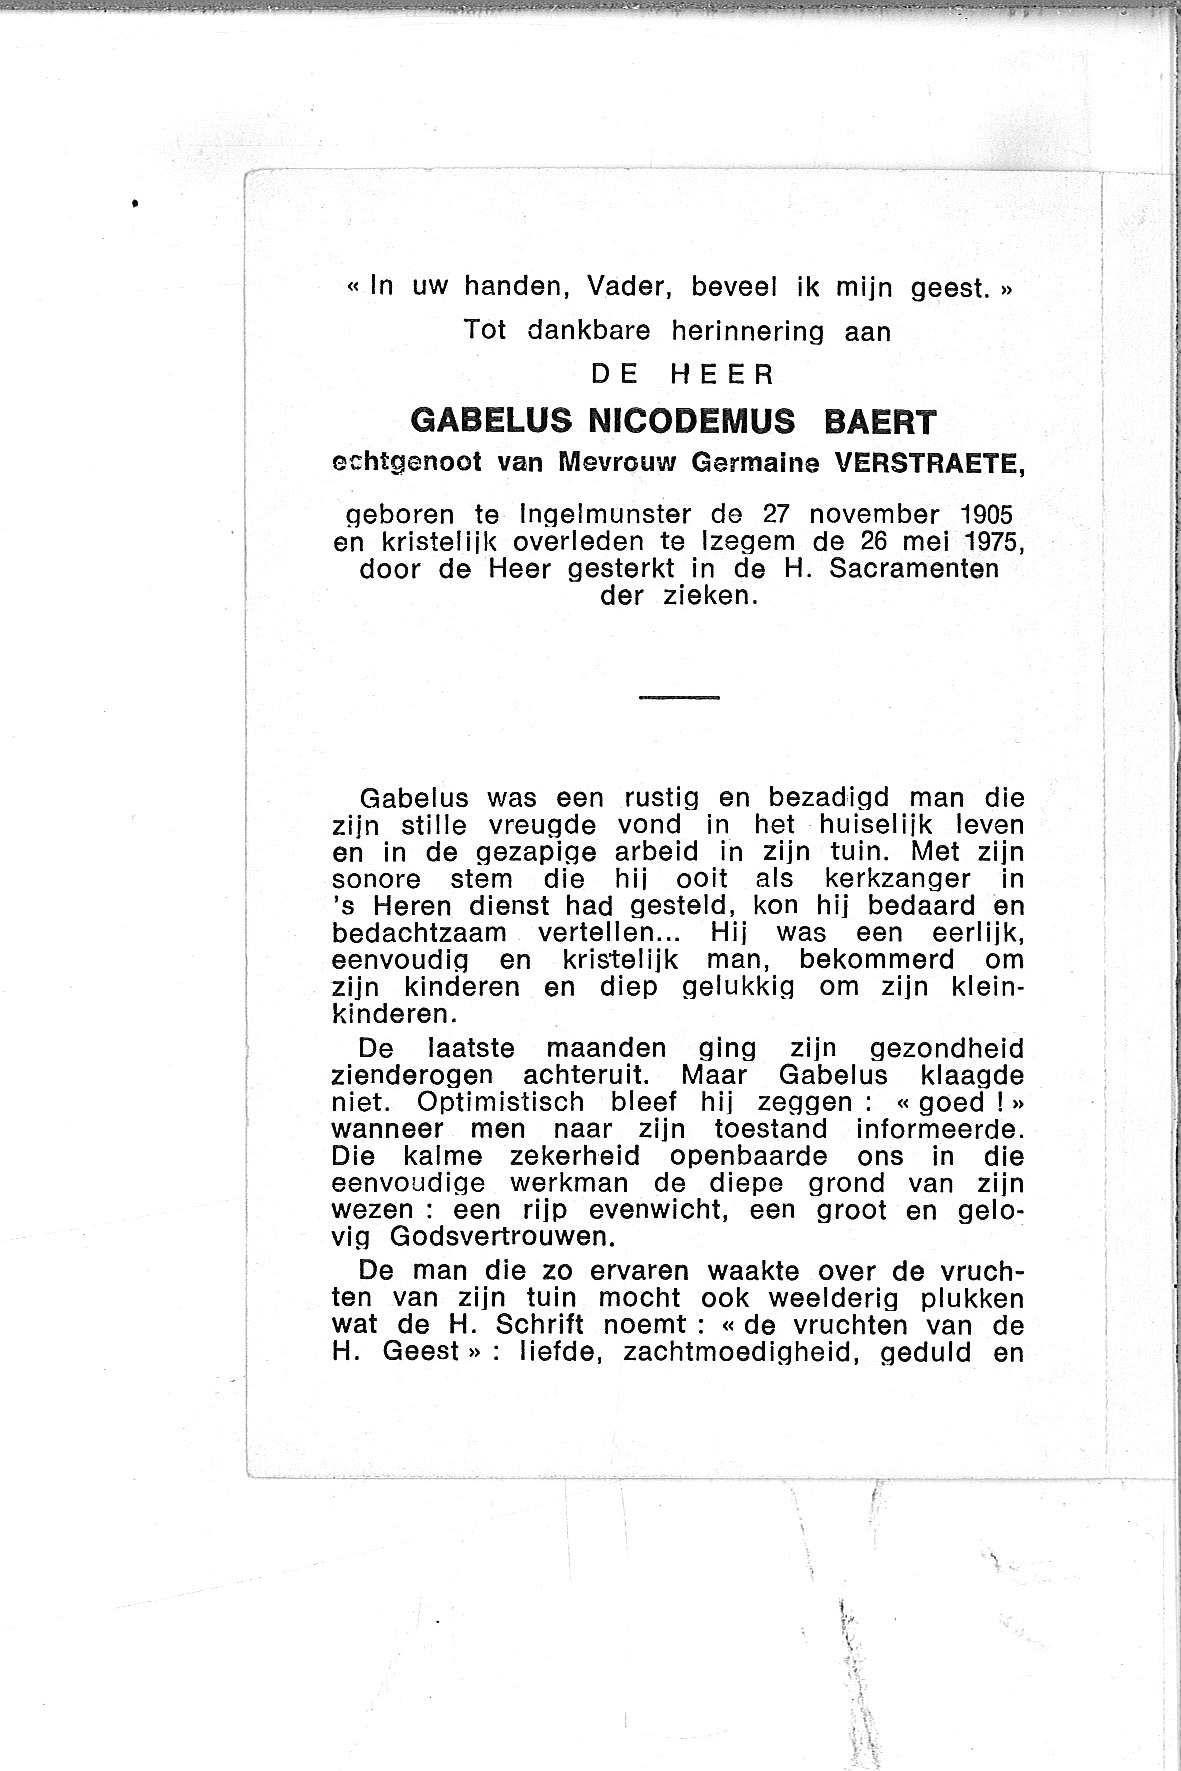 Gabelus-Nicodemus(1975)20130826134141_00052.jpg